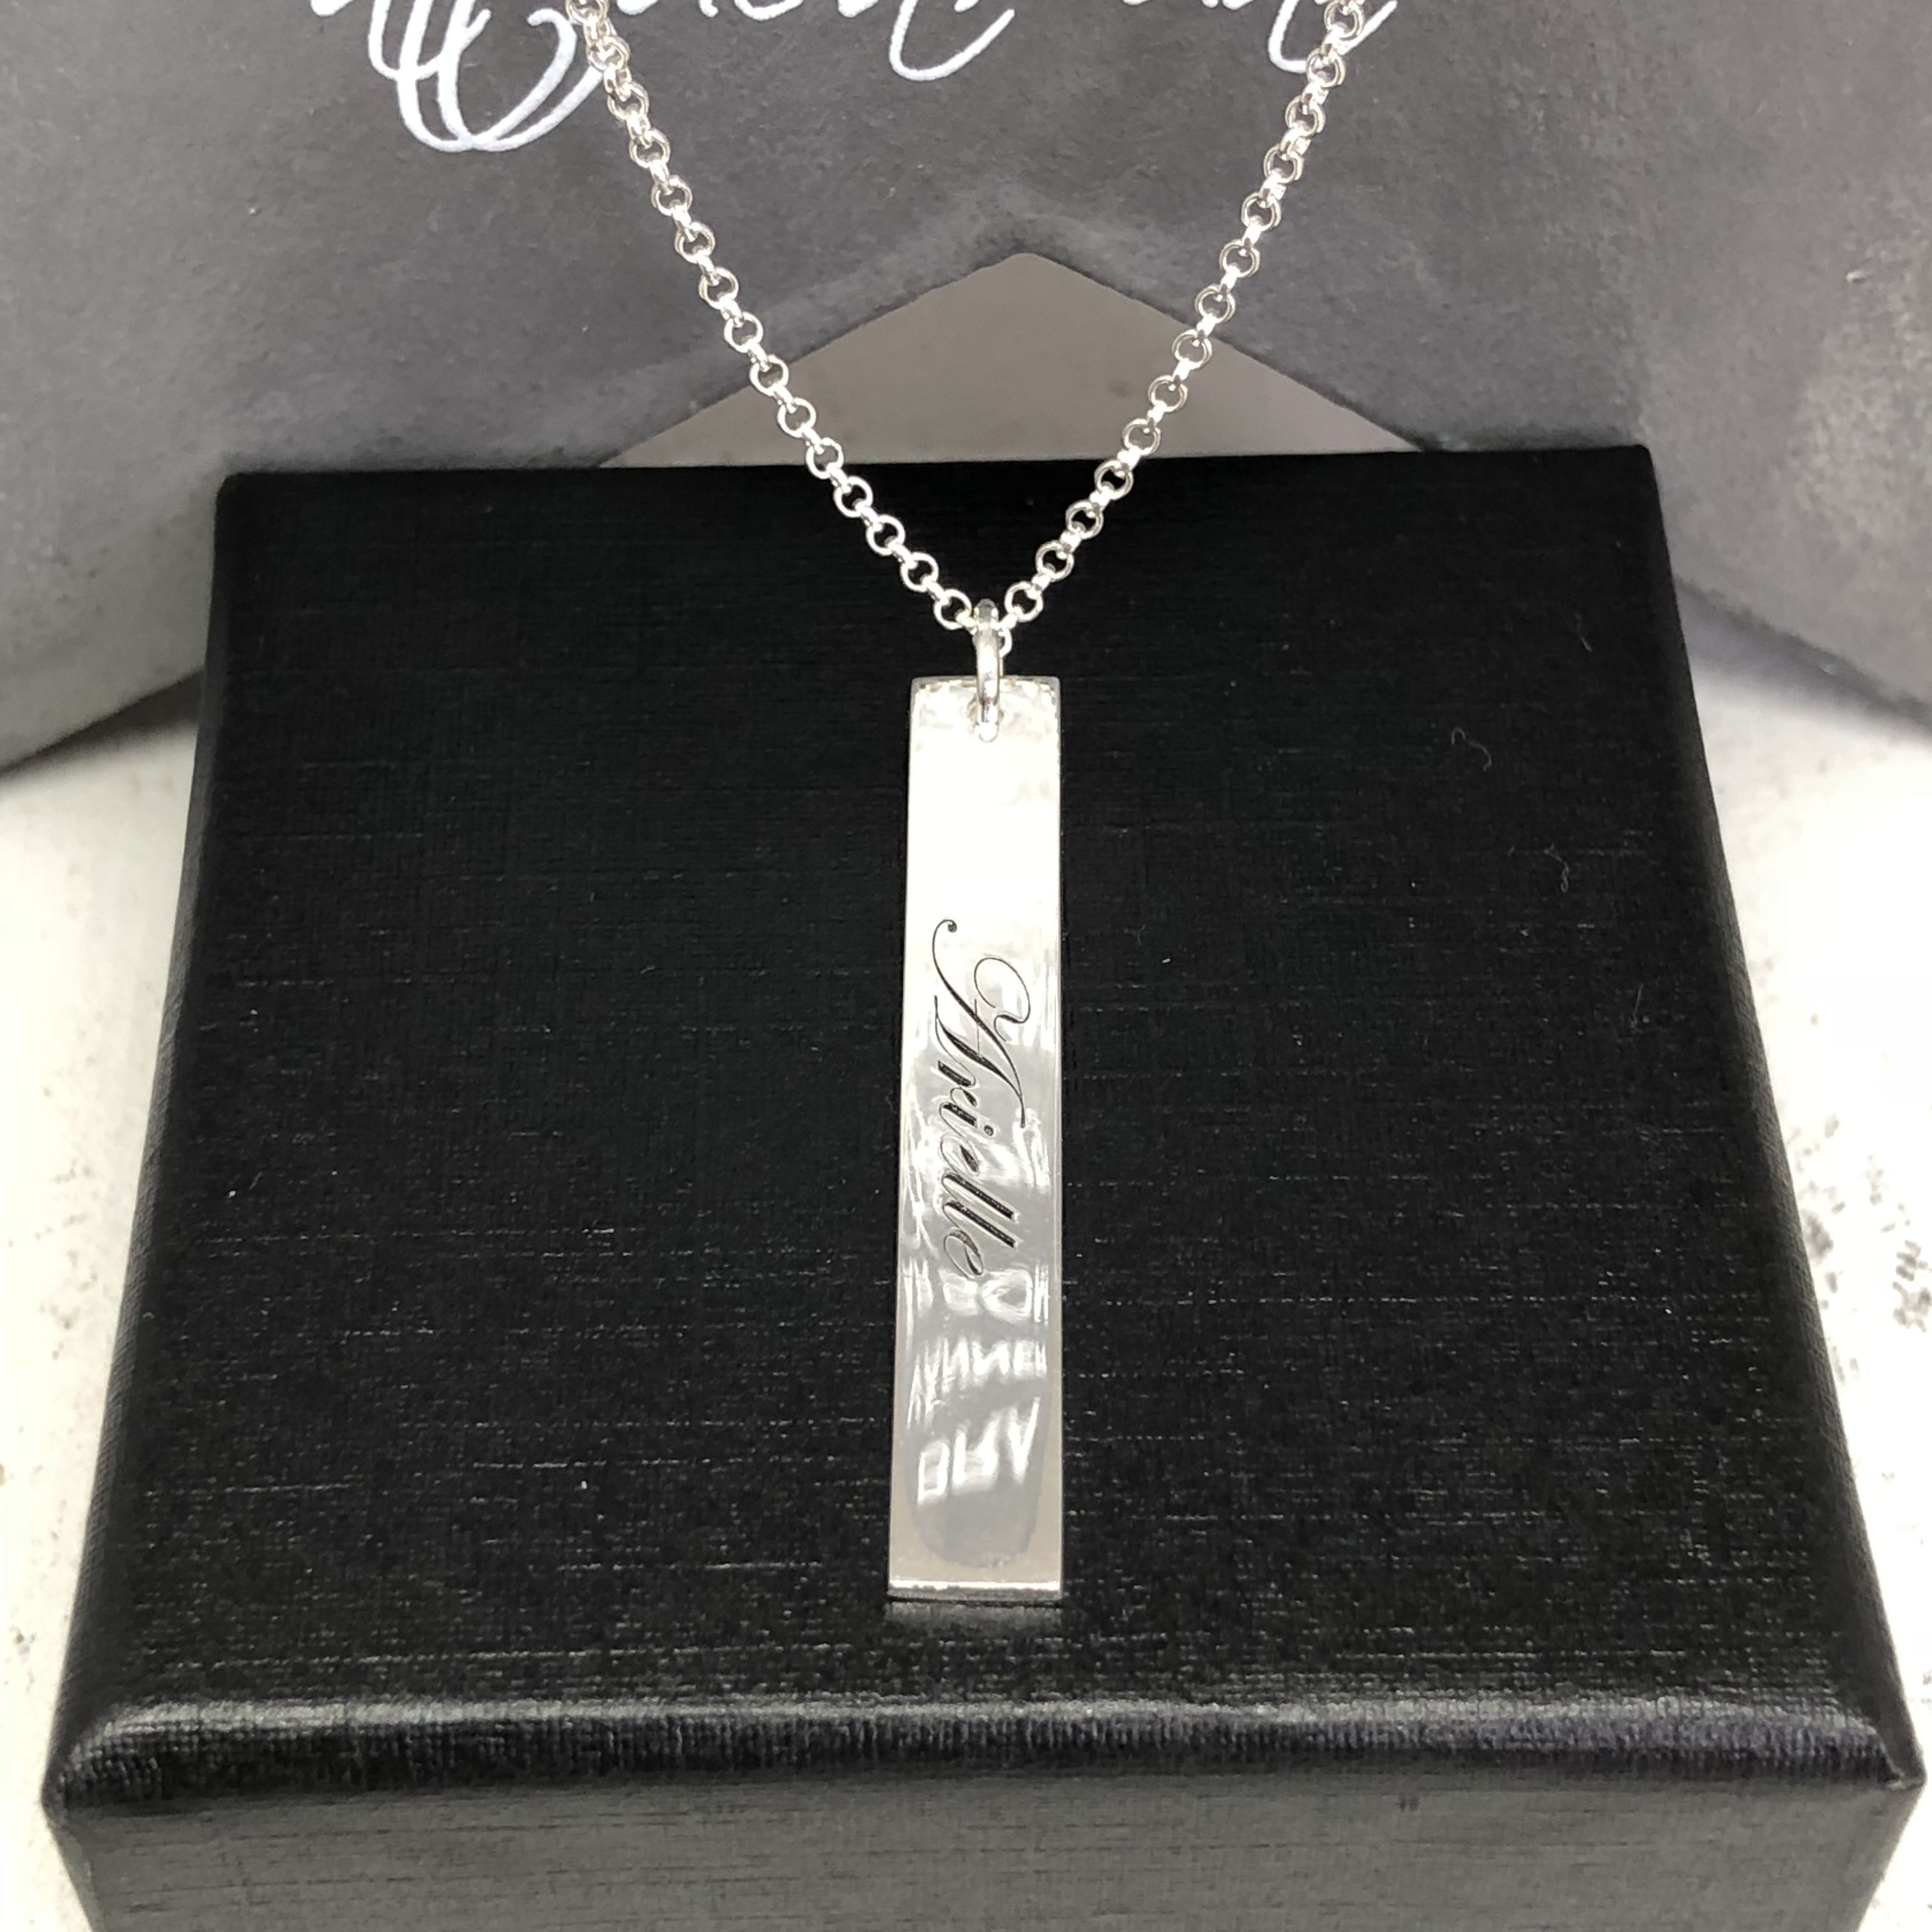 namnhalsband i 925 silver.  1851bfb63e01c